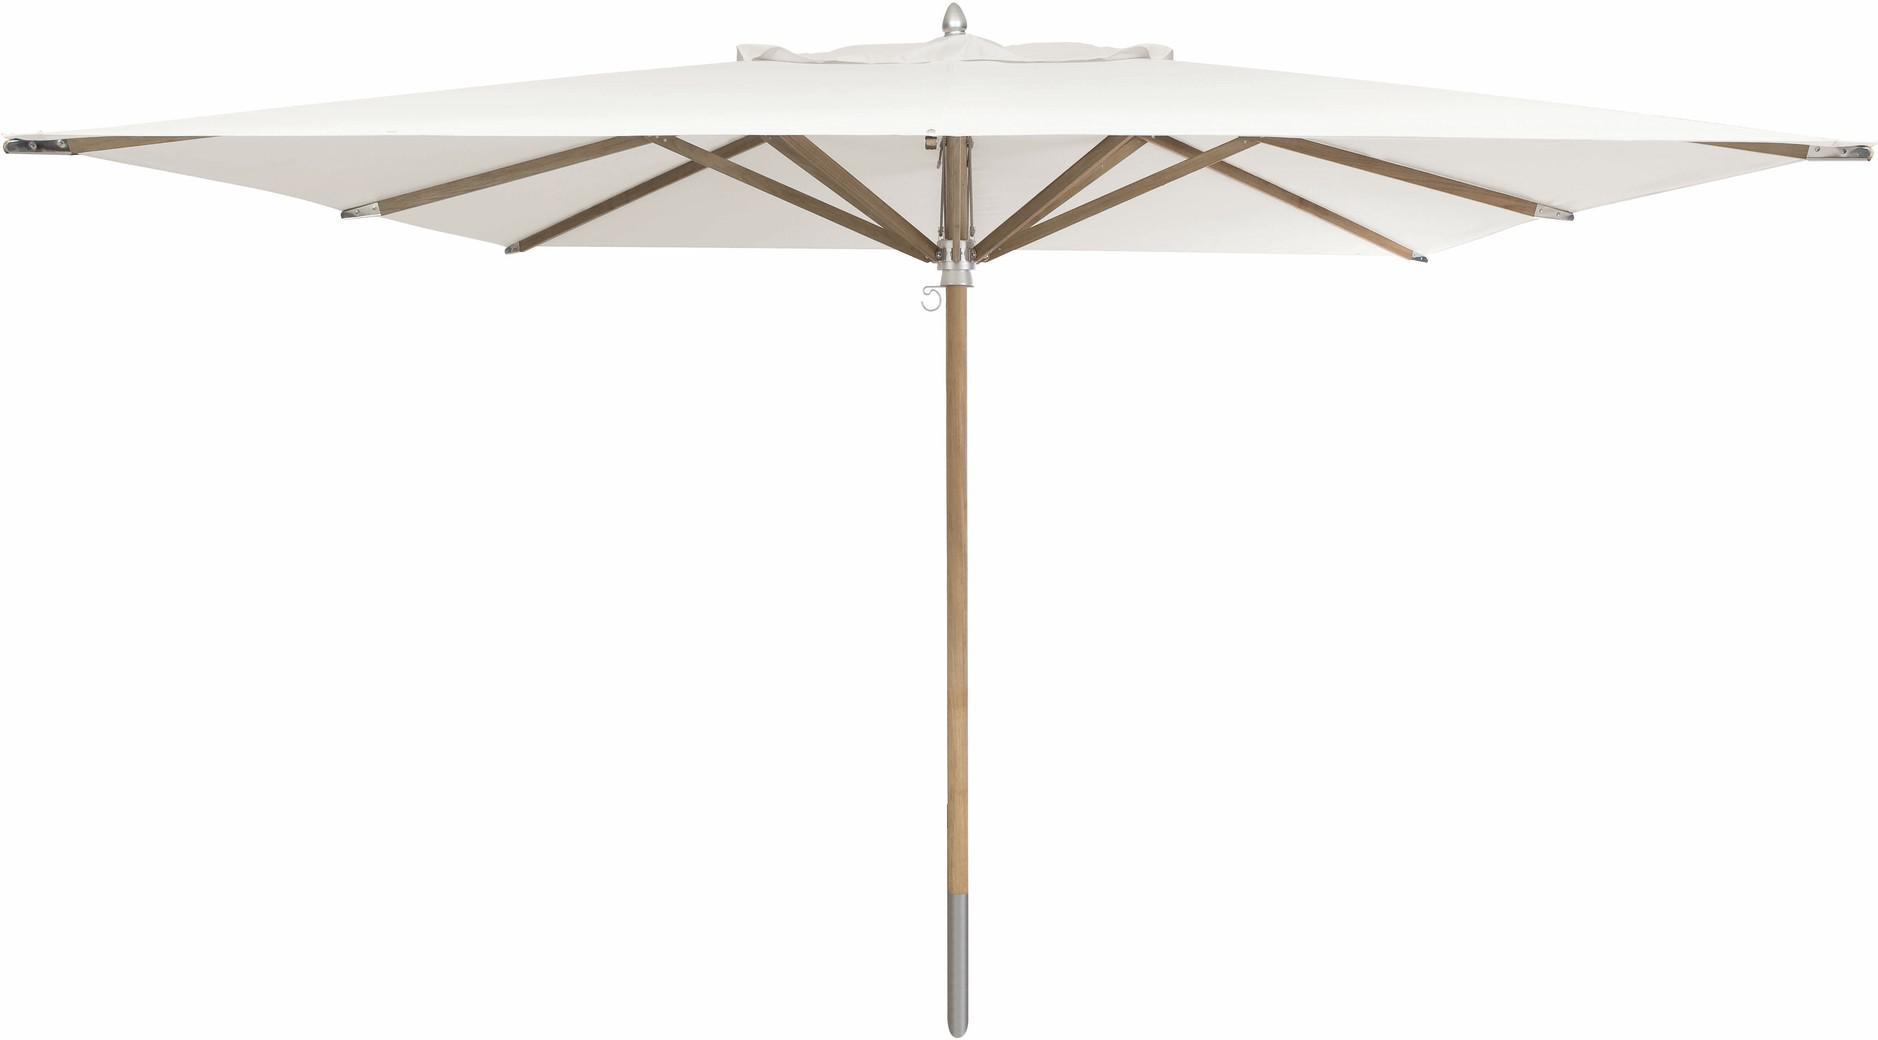 Umbrella central pole teak 350*350 canvas